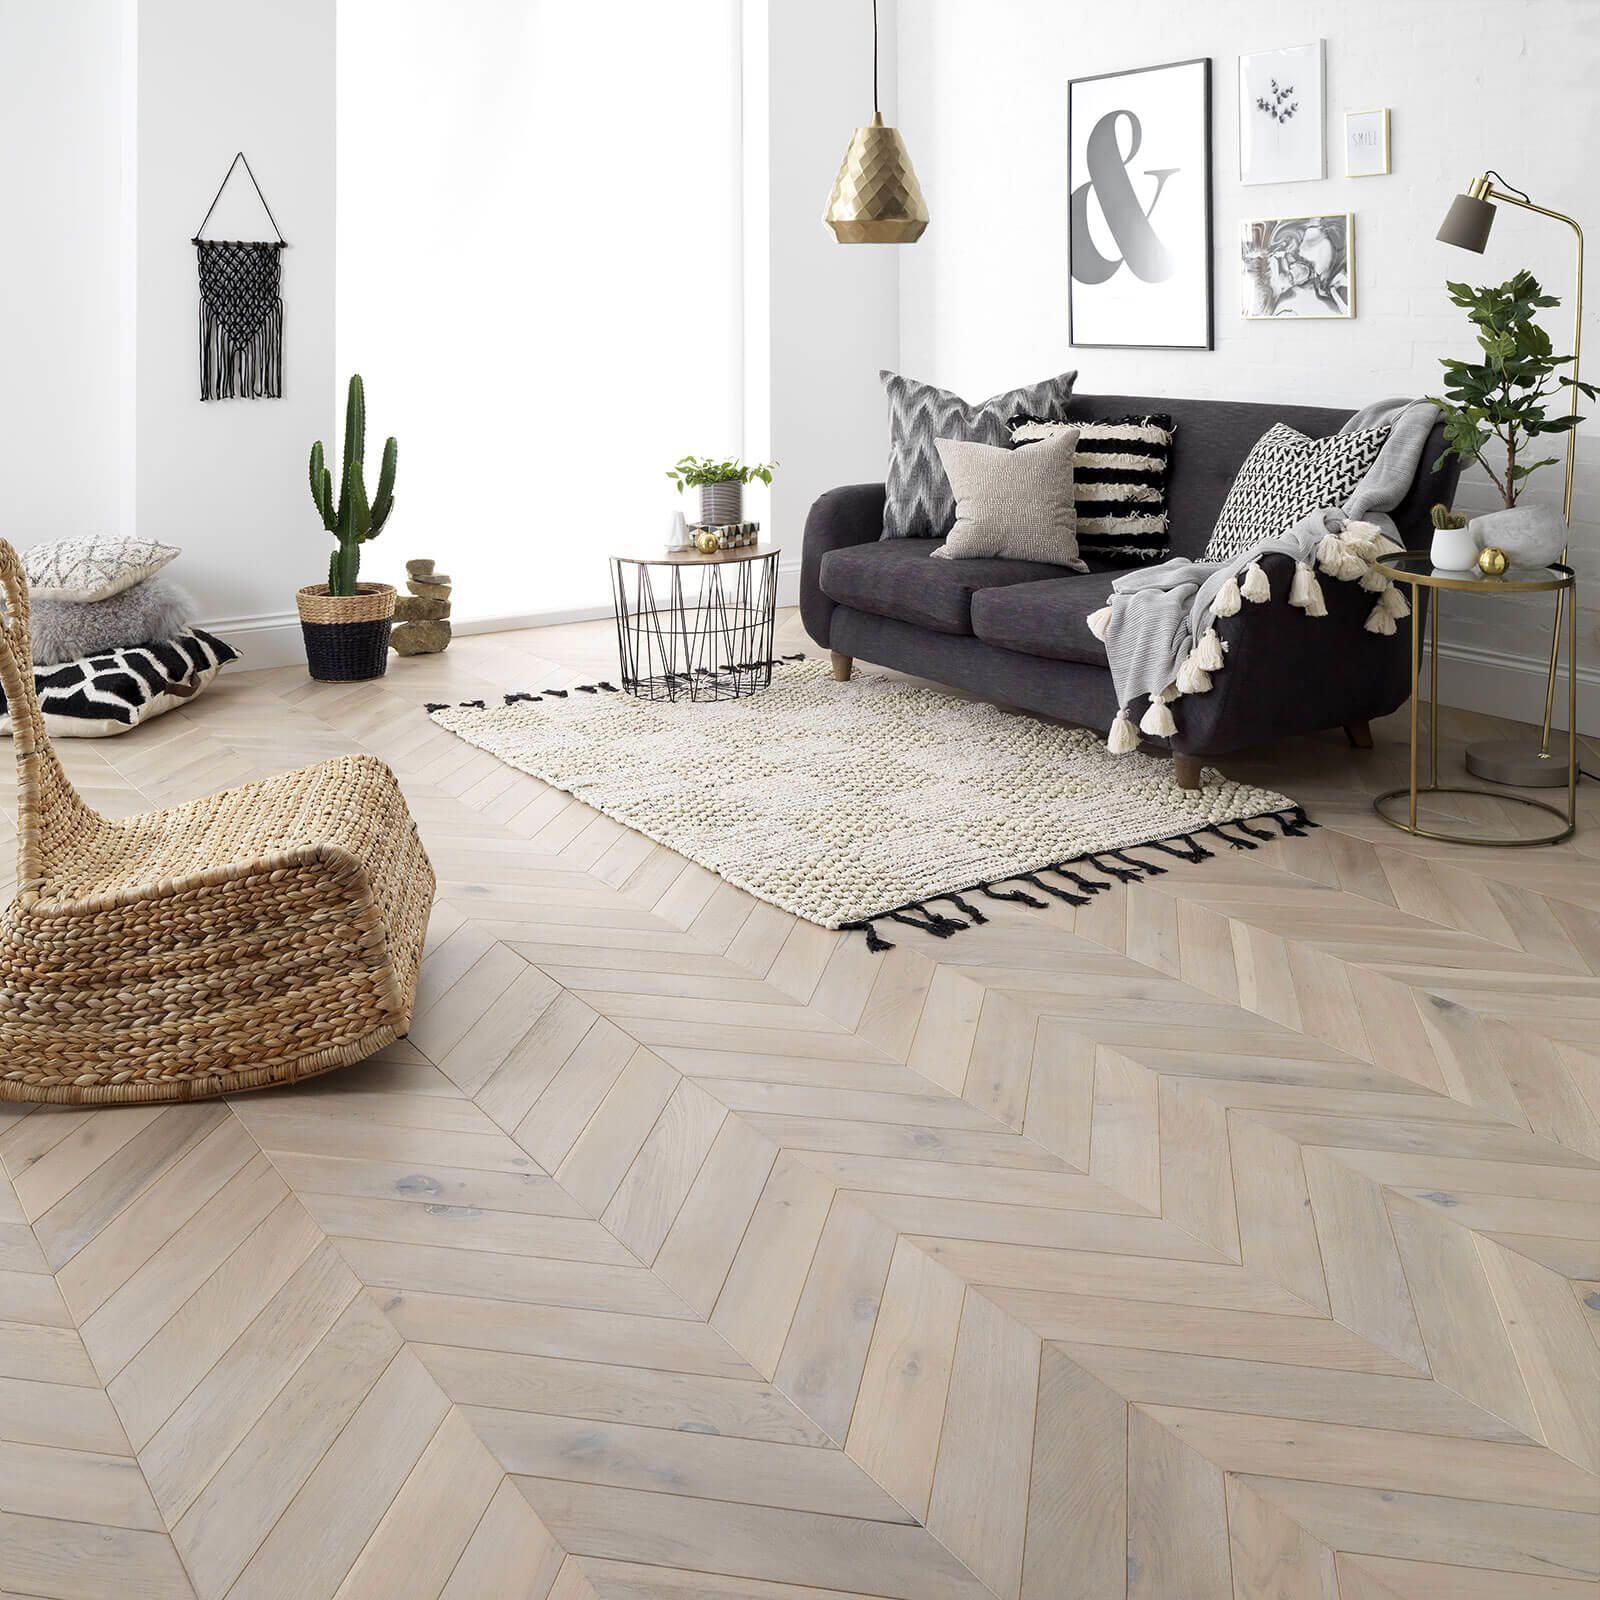 Pin by Flooring Village on Engineered Wood Flooring in 2019